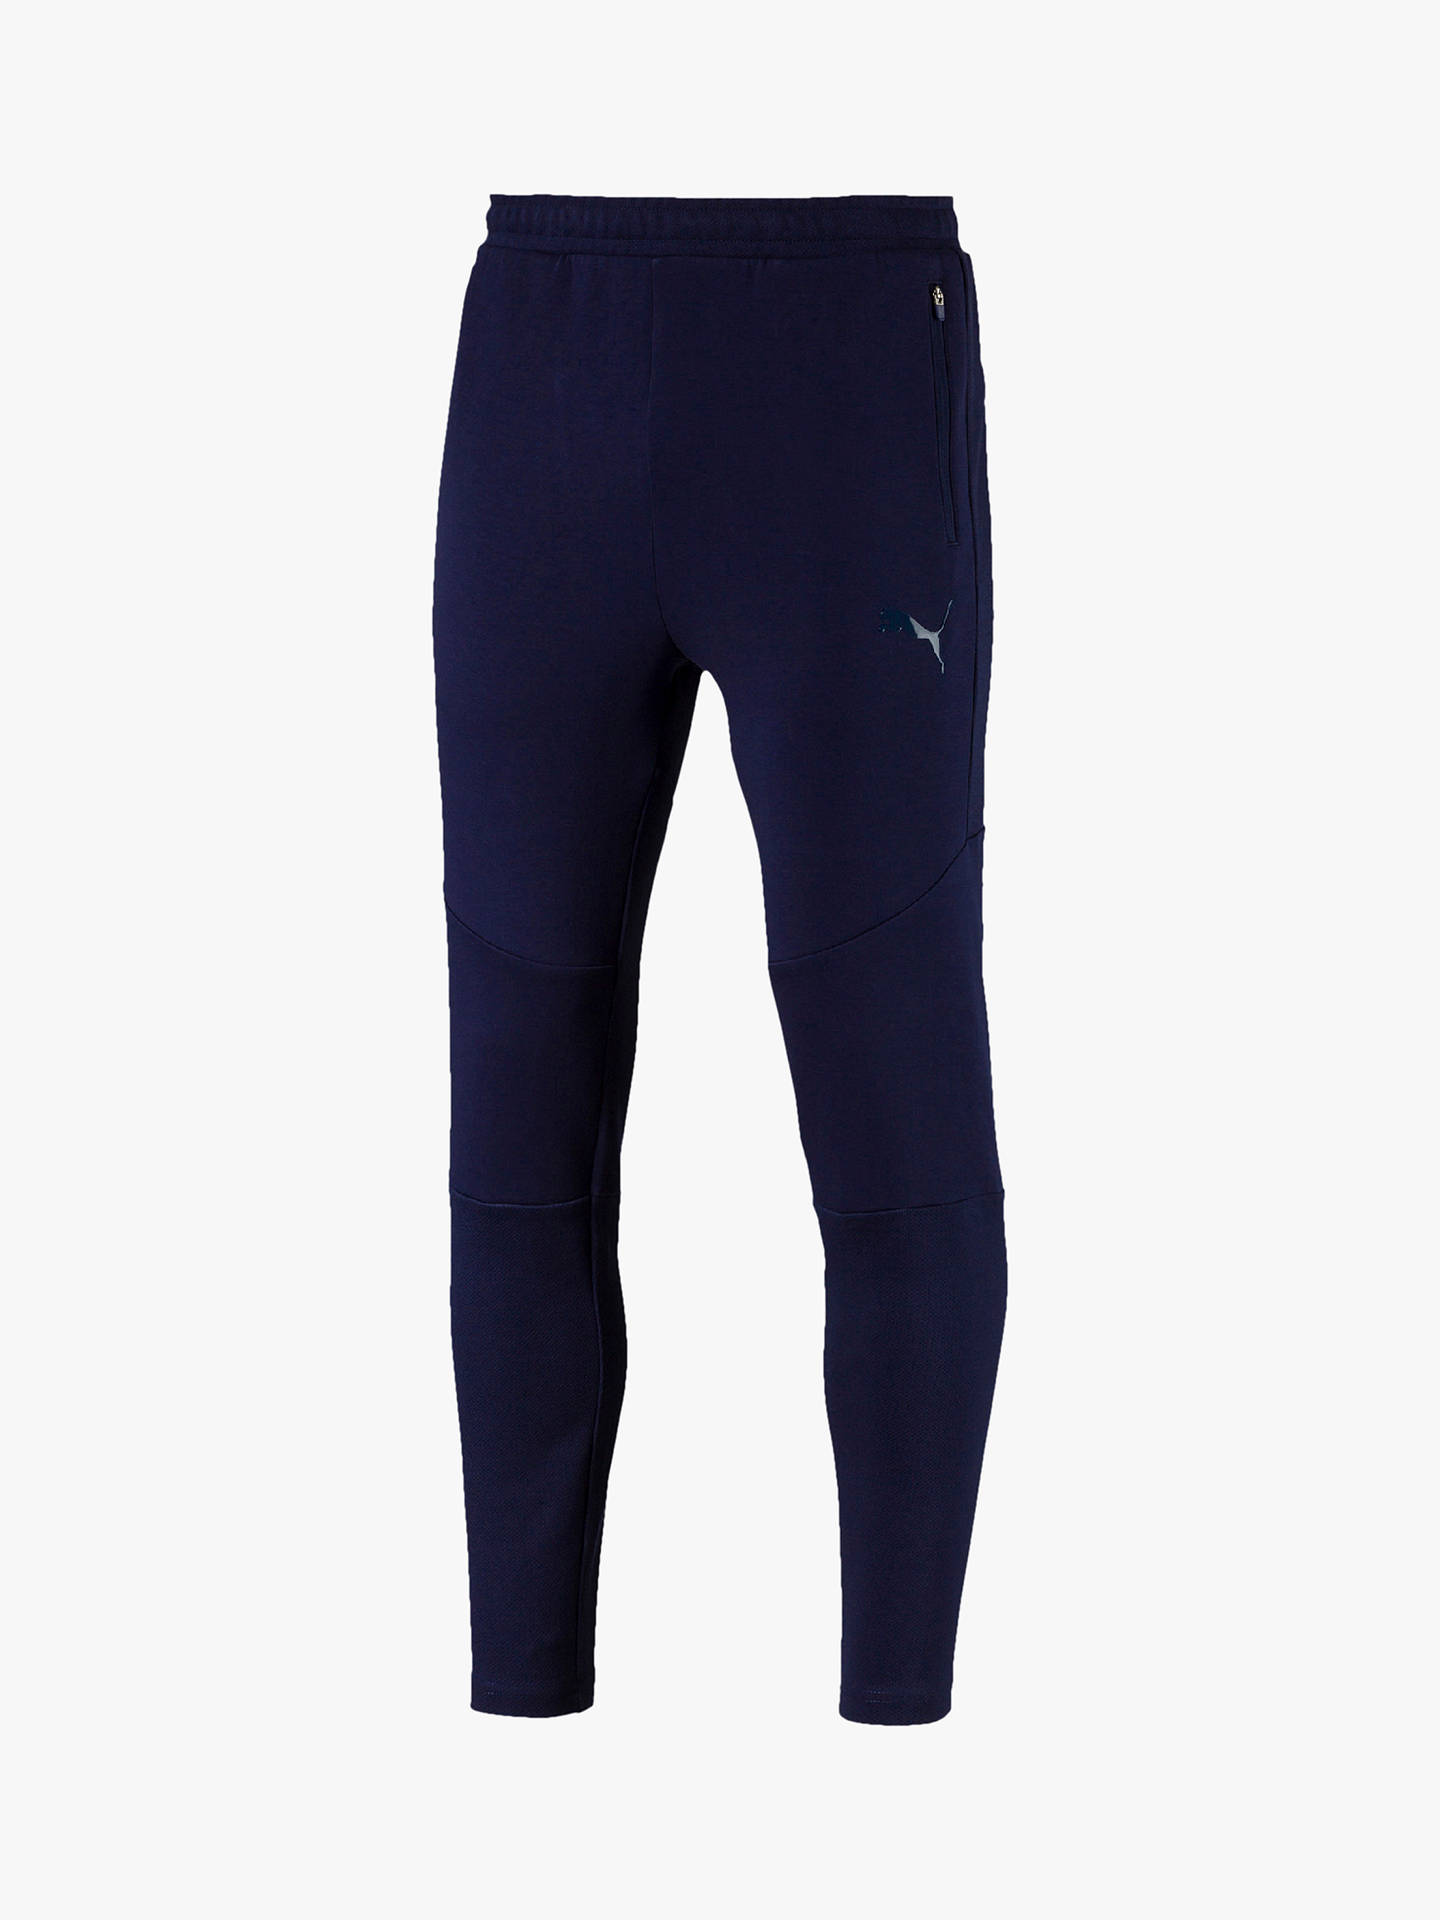 3ab10da5 PUMA Evostripe Move Sweat Pants, Blue at John Lewis & Partners